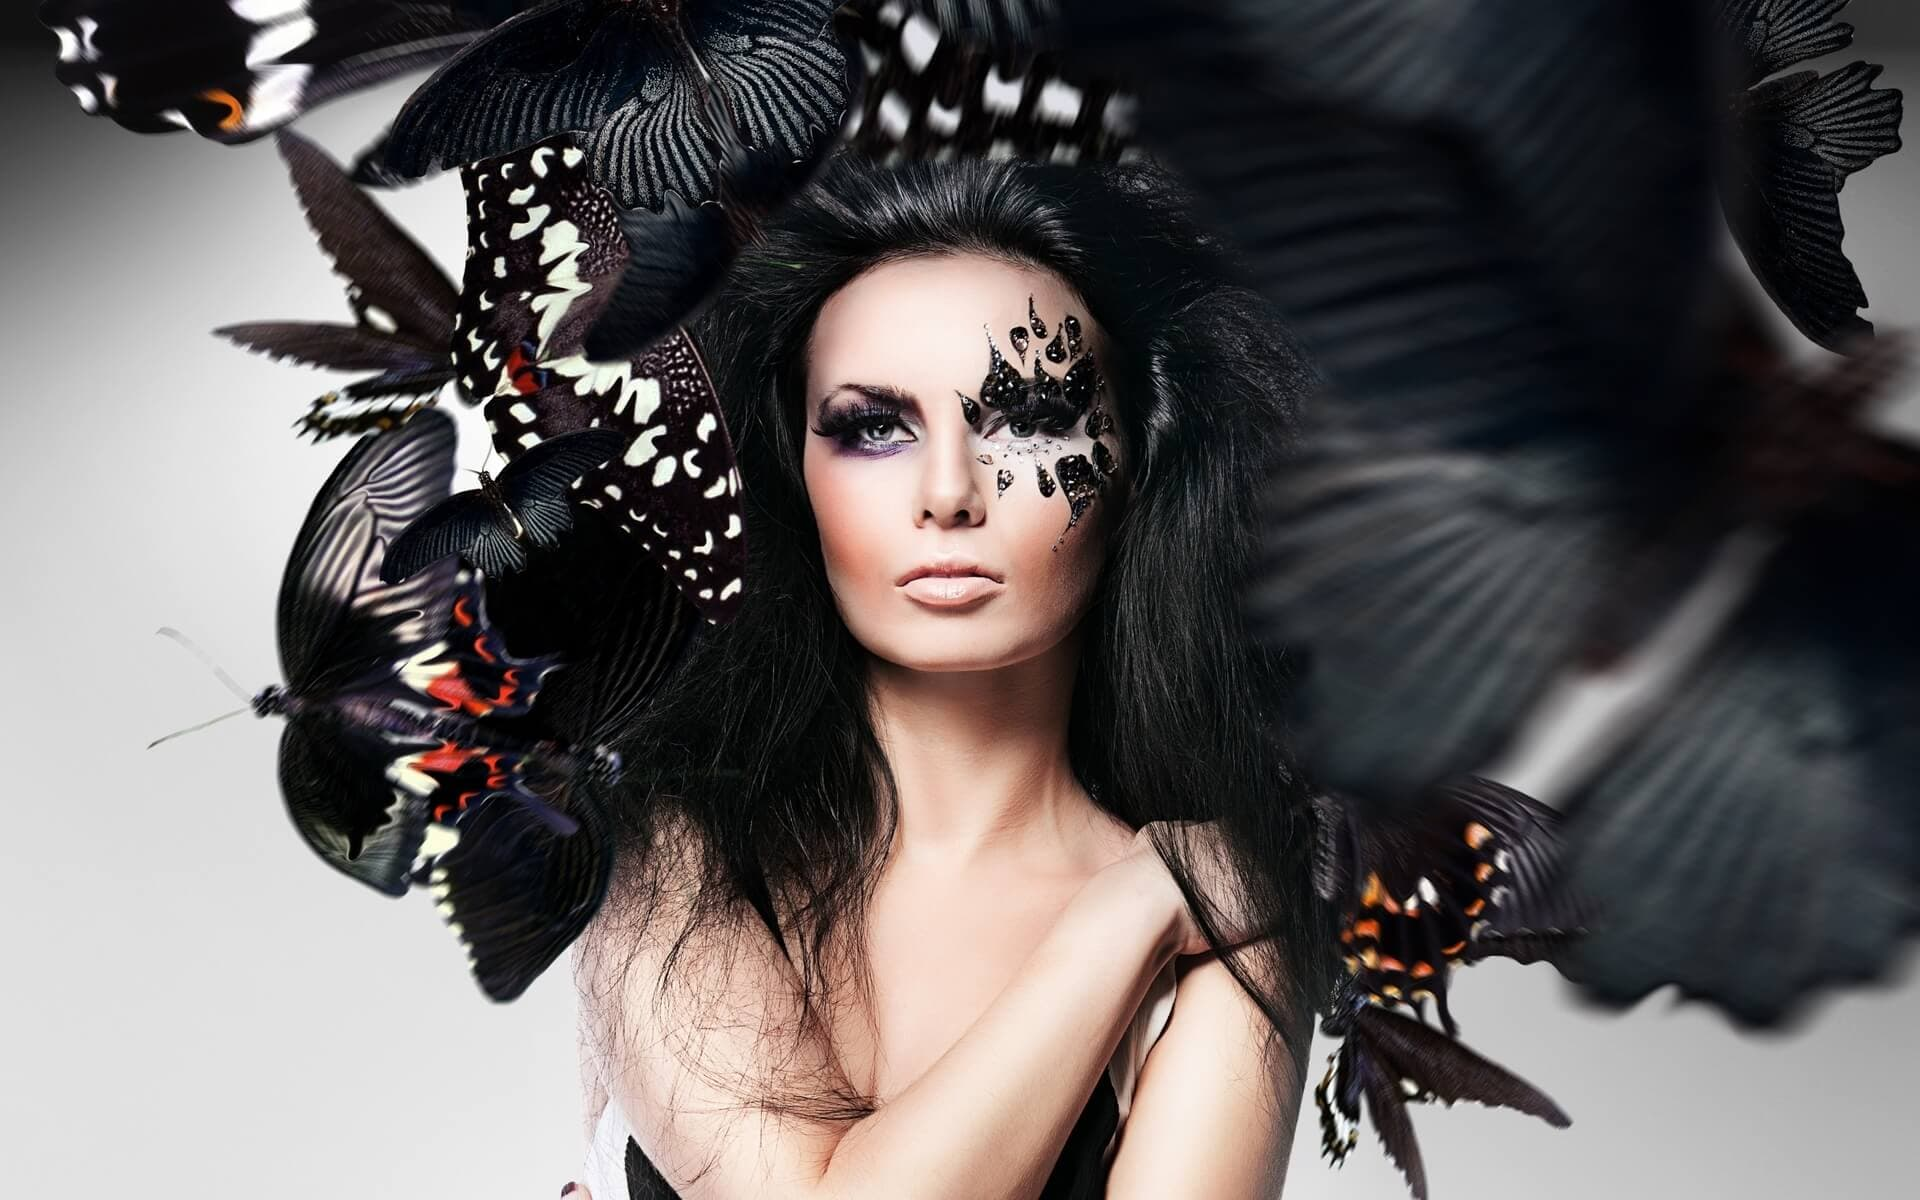 Extreme Makeup. Θεατρικό Μακιγιάζ. Μακιγιάζ για Απόκριες - Makeup trends